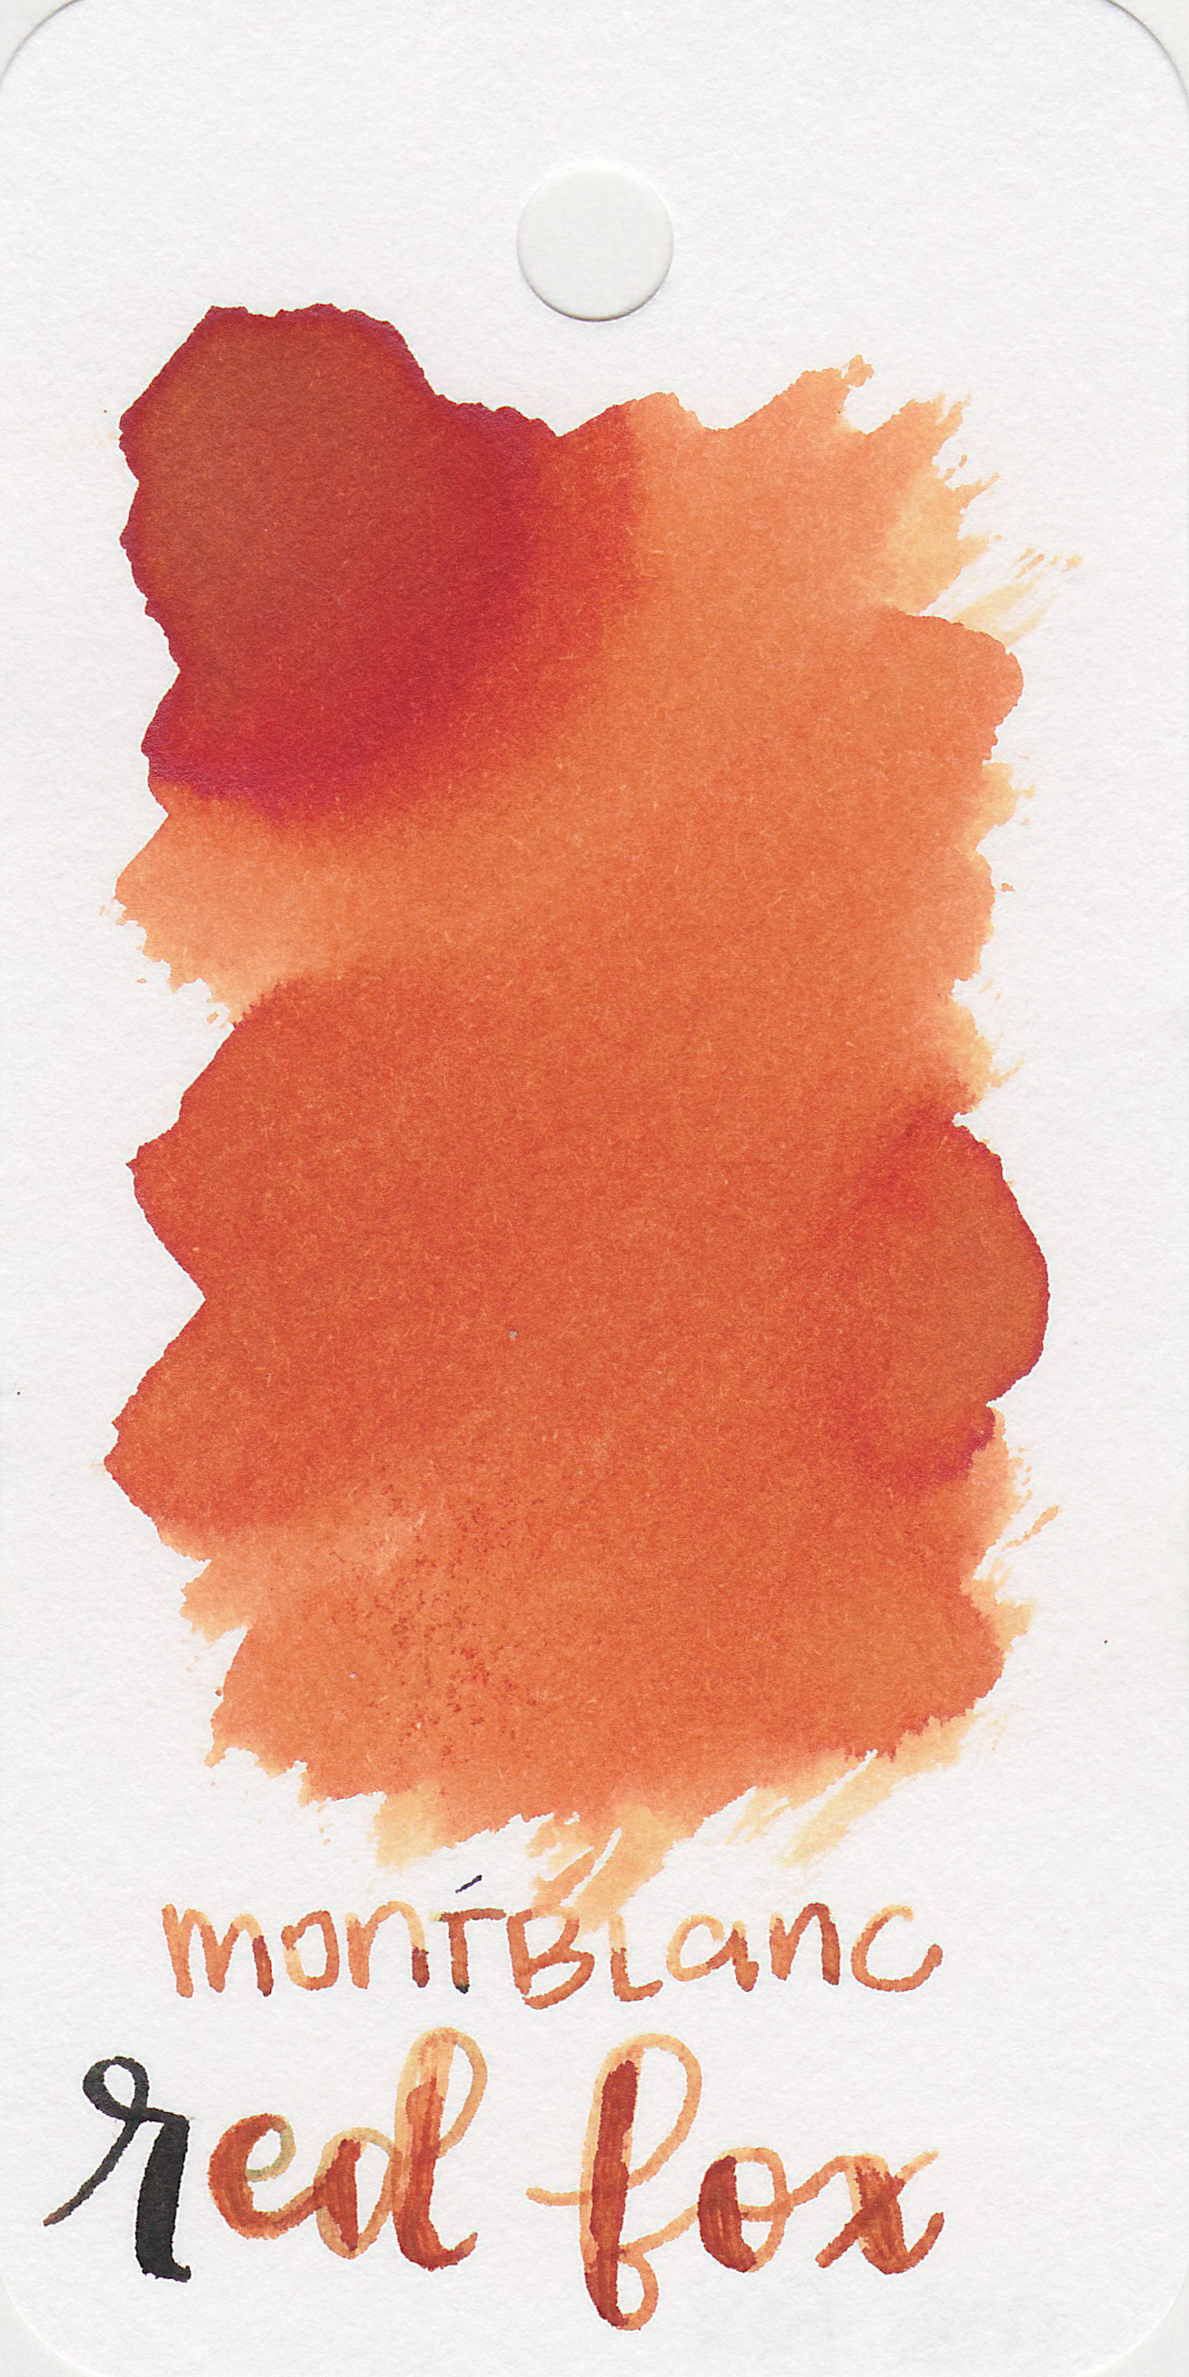 mb-red-fox-1.jpg